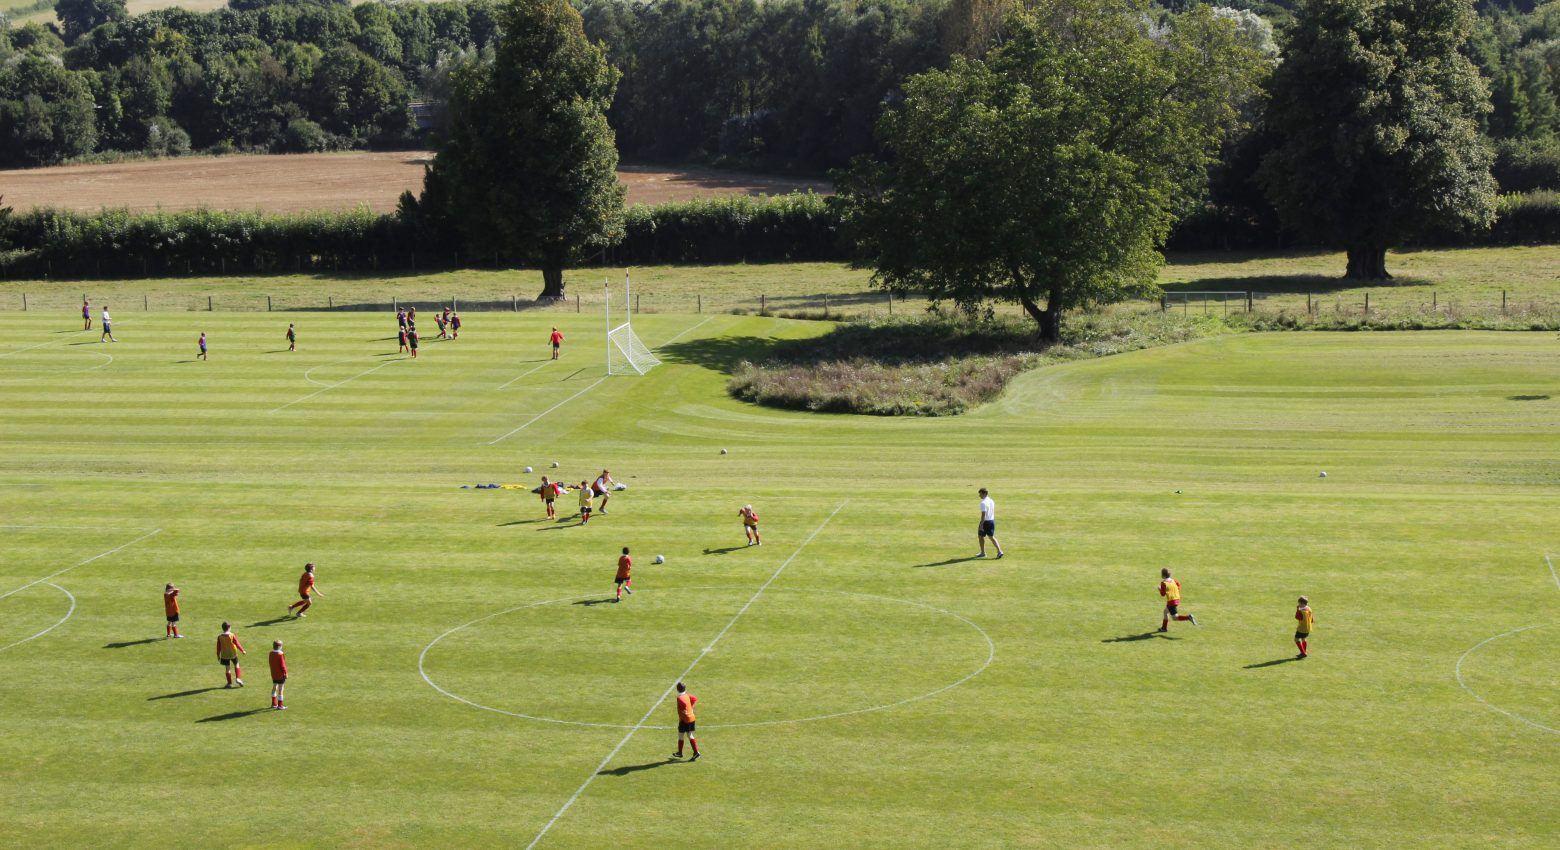 Football practise